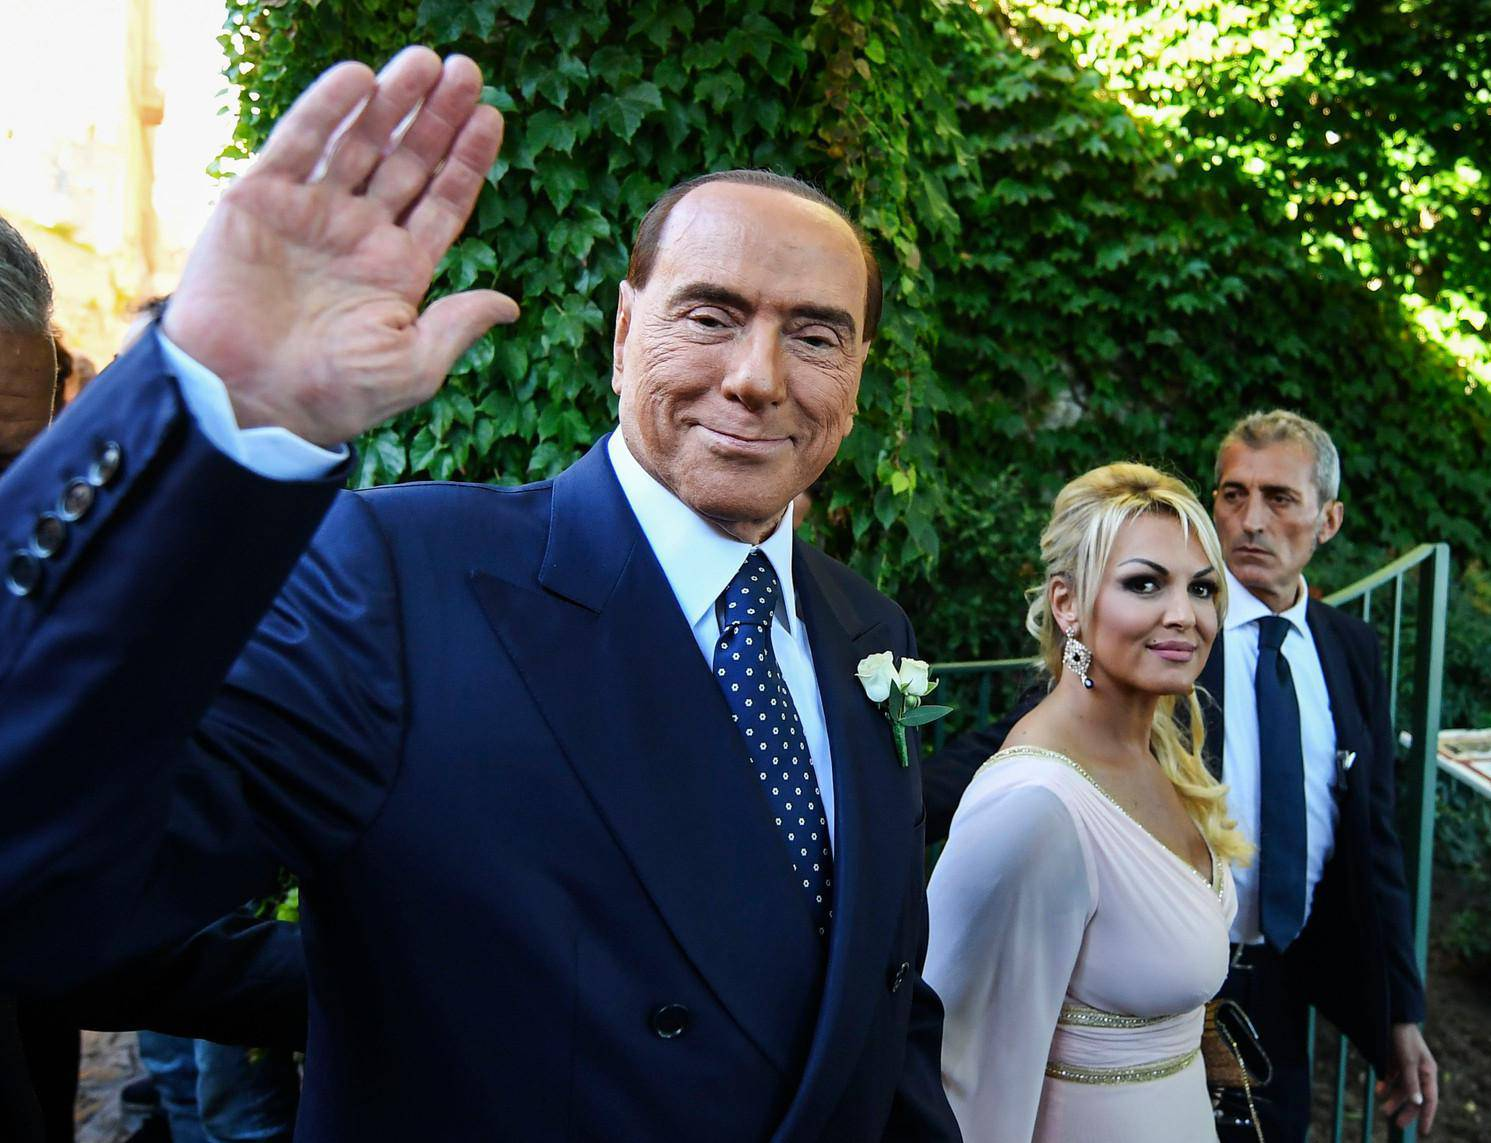 Ravello, Silvio Berlusconi at the marriage of Marianna Pascale